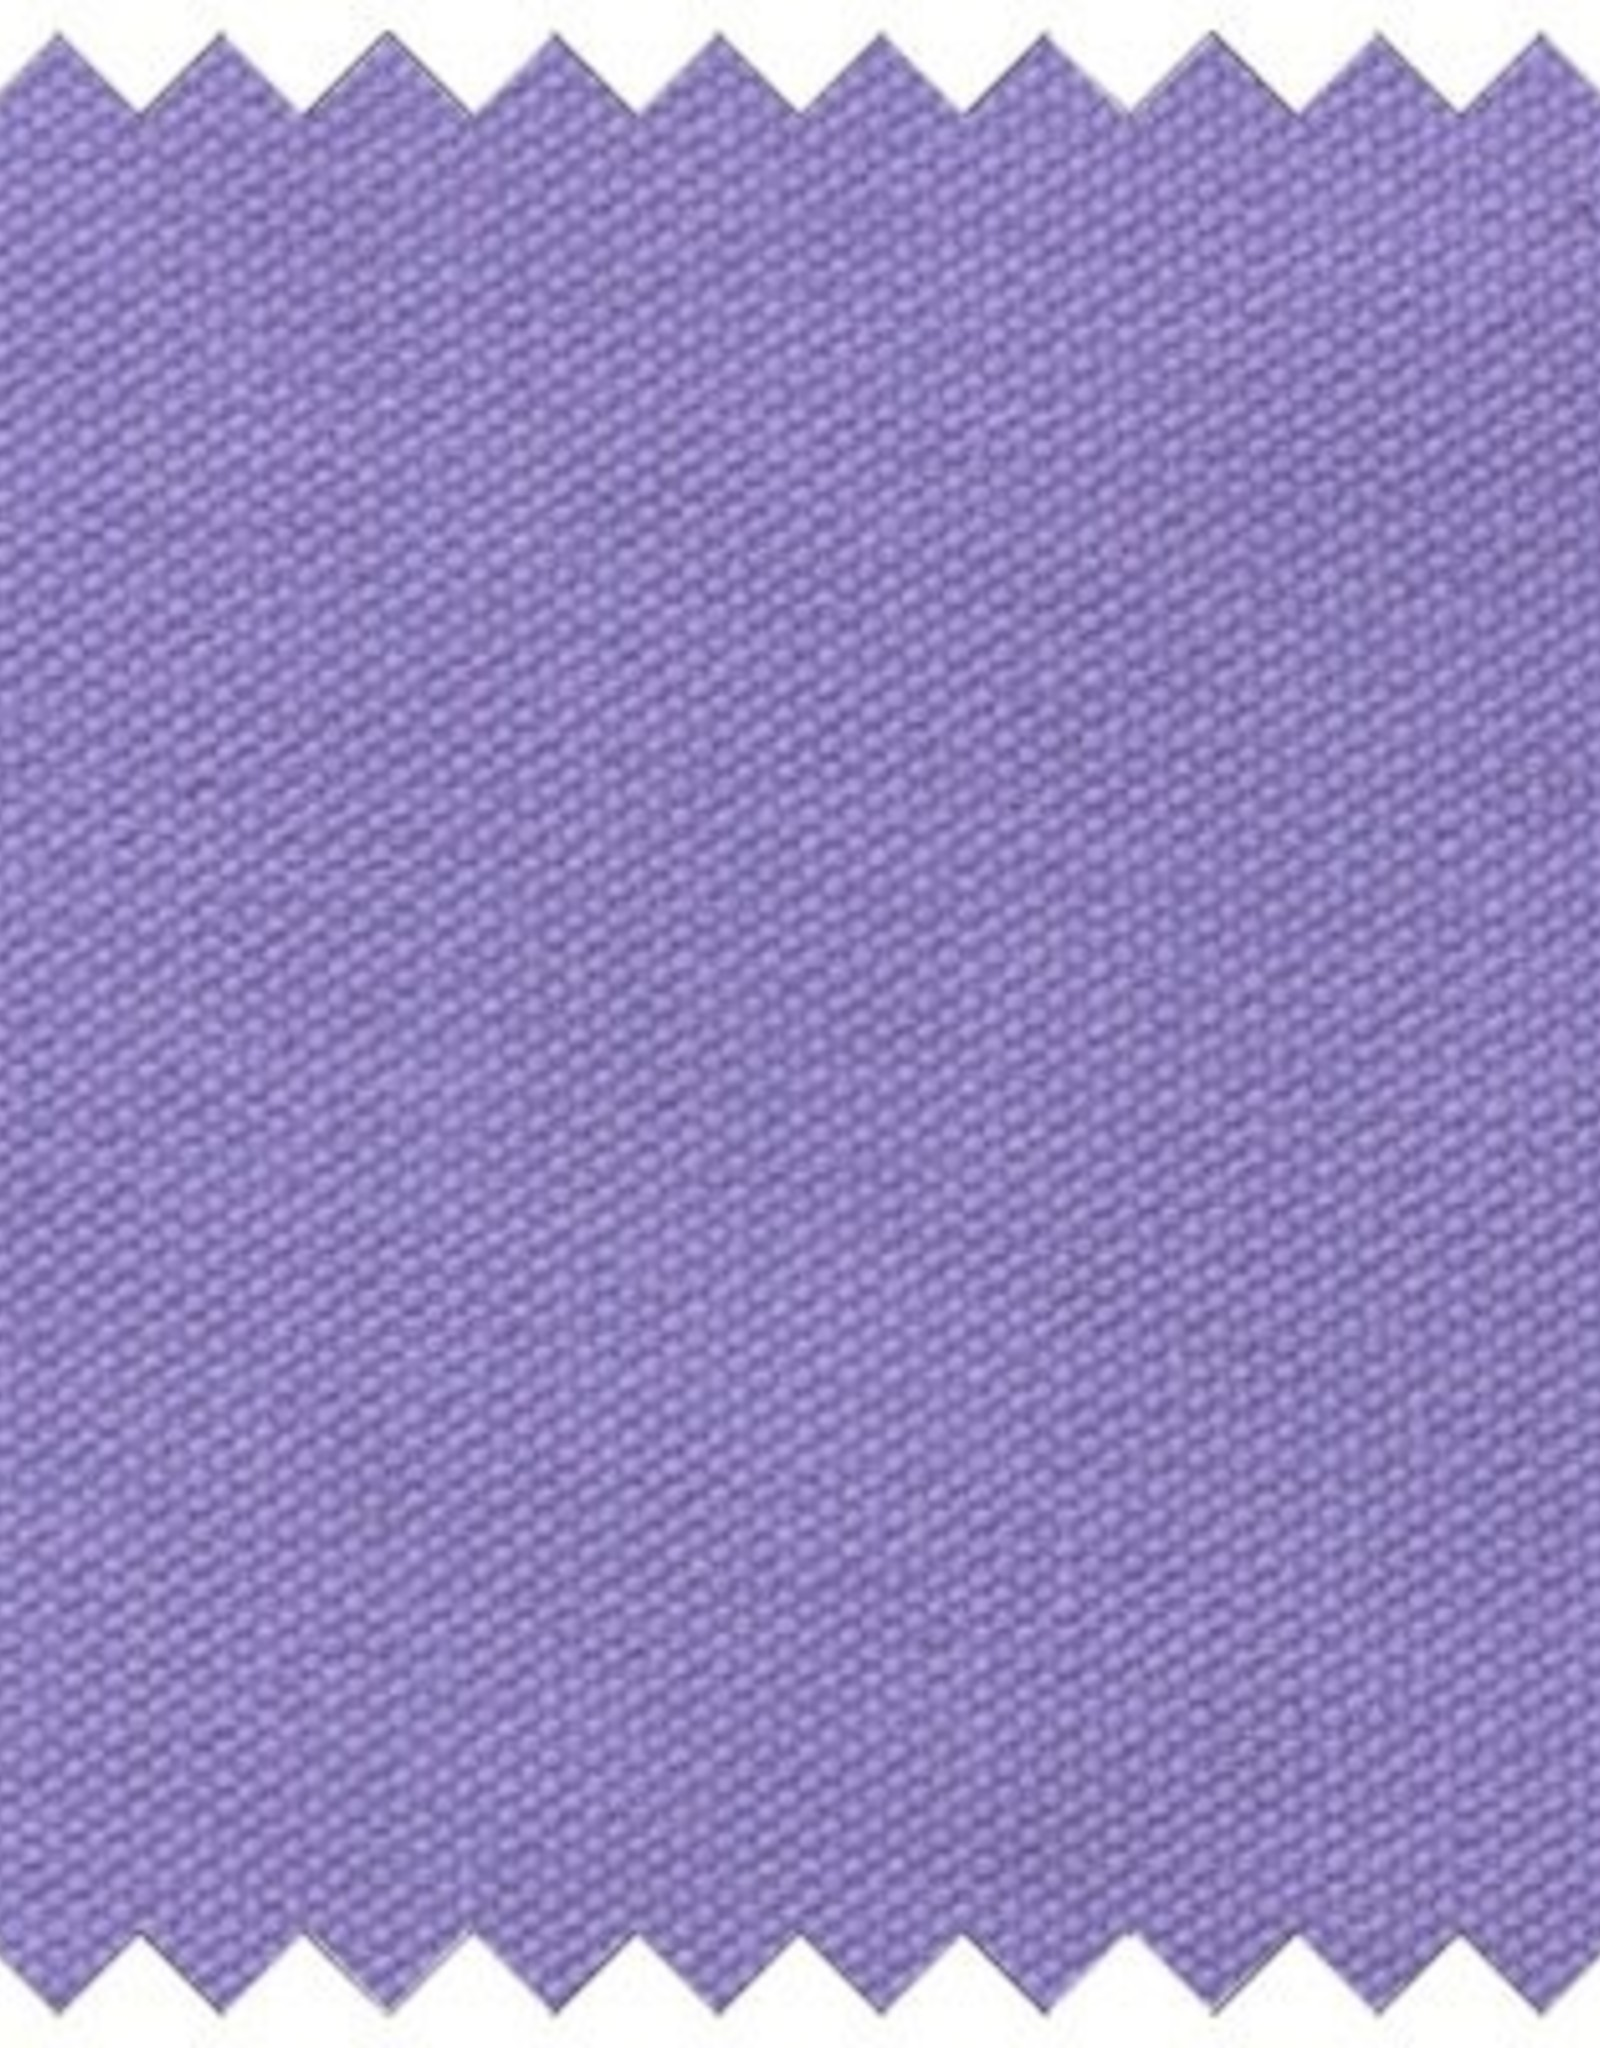 Carolina Morning Designs Zabuton - Large - Organic Lavender